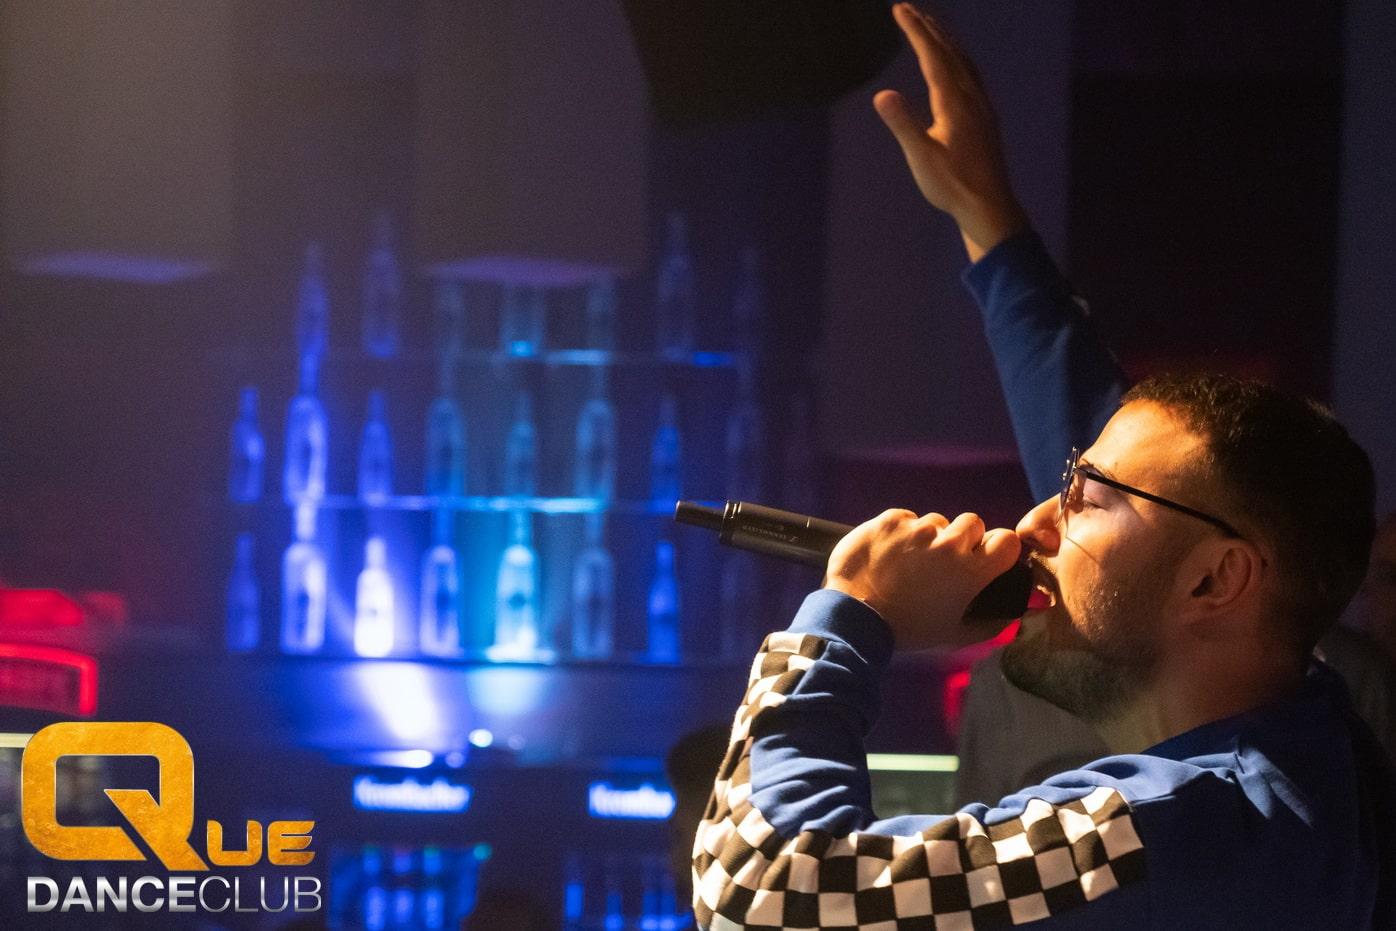 2018_12_08_Que_Danceclub_Paparazzo_Night_Ardian_Bujupi_Live_Nightlife_Scene_Timo_051